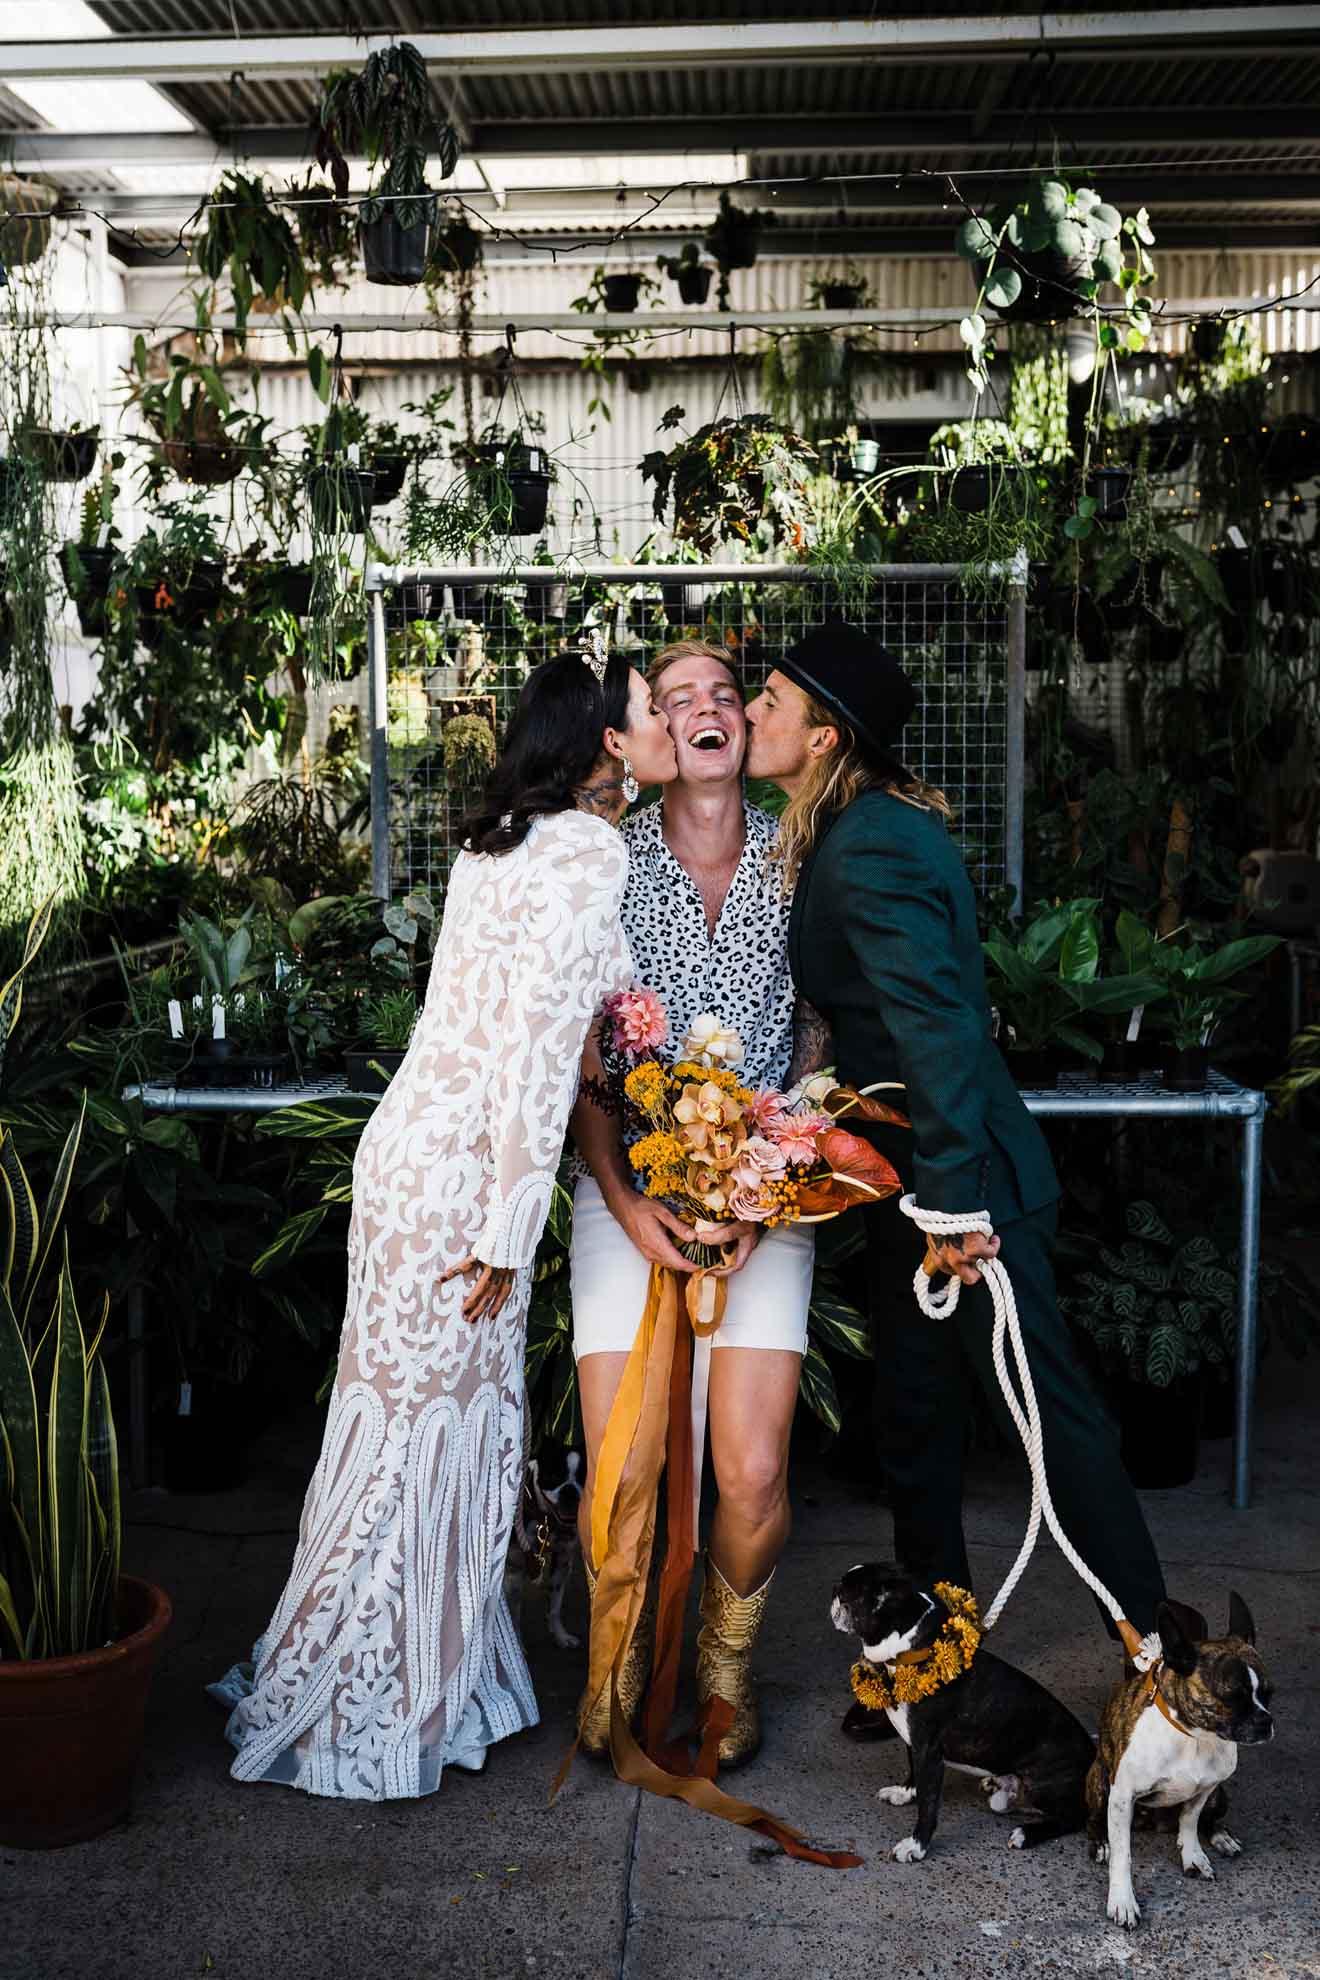 Holymatrimonty lesbian gay same-sex couple wedding civil marriage celebrant Newcastle NSW Australia Dancing With Her directory magazine